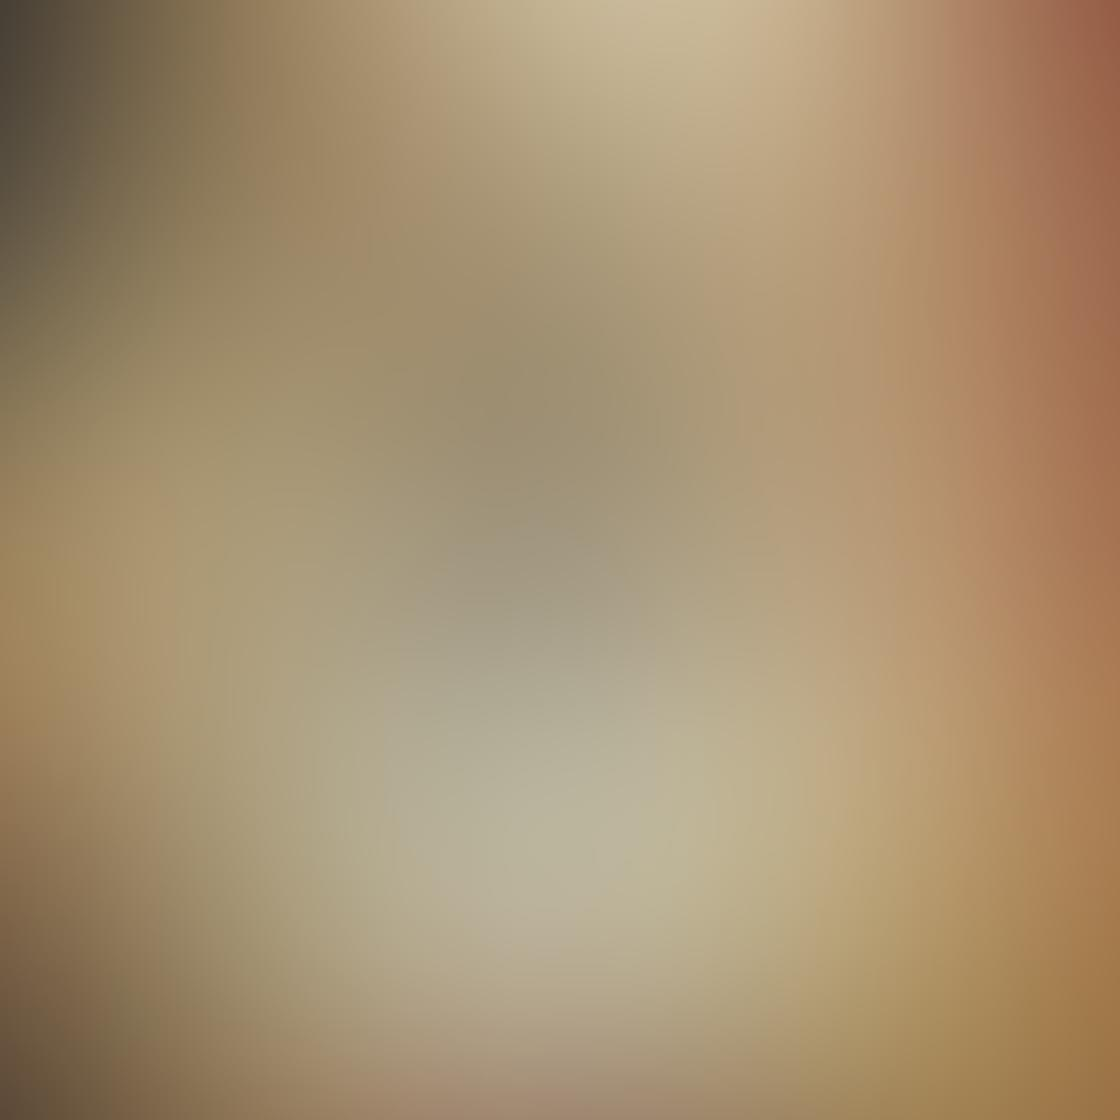 iPhone Reflection Photo 11